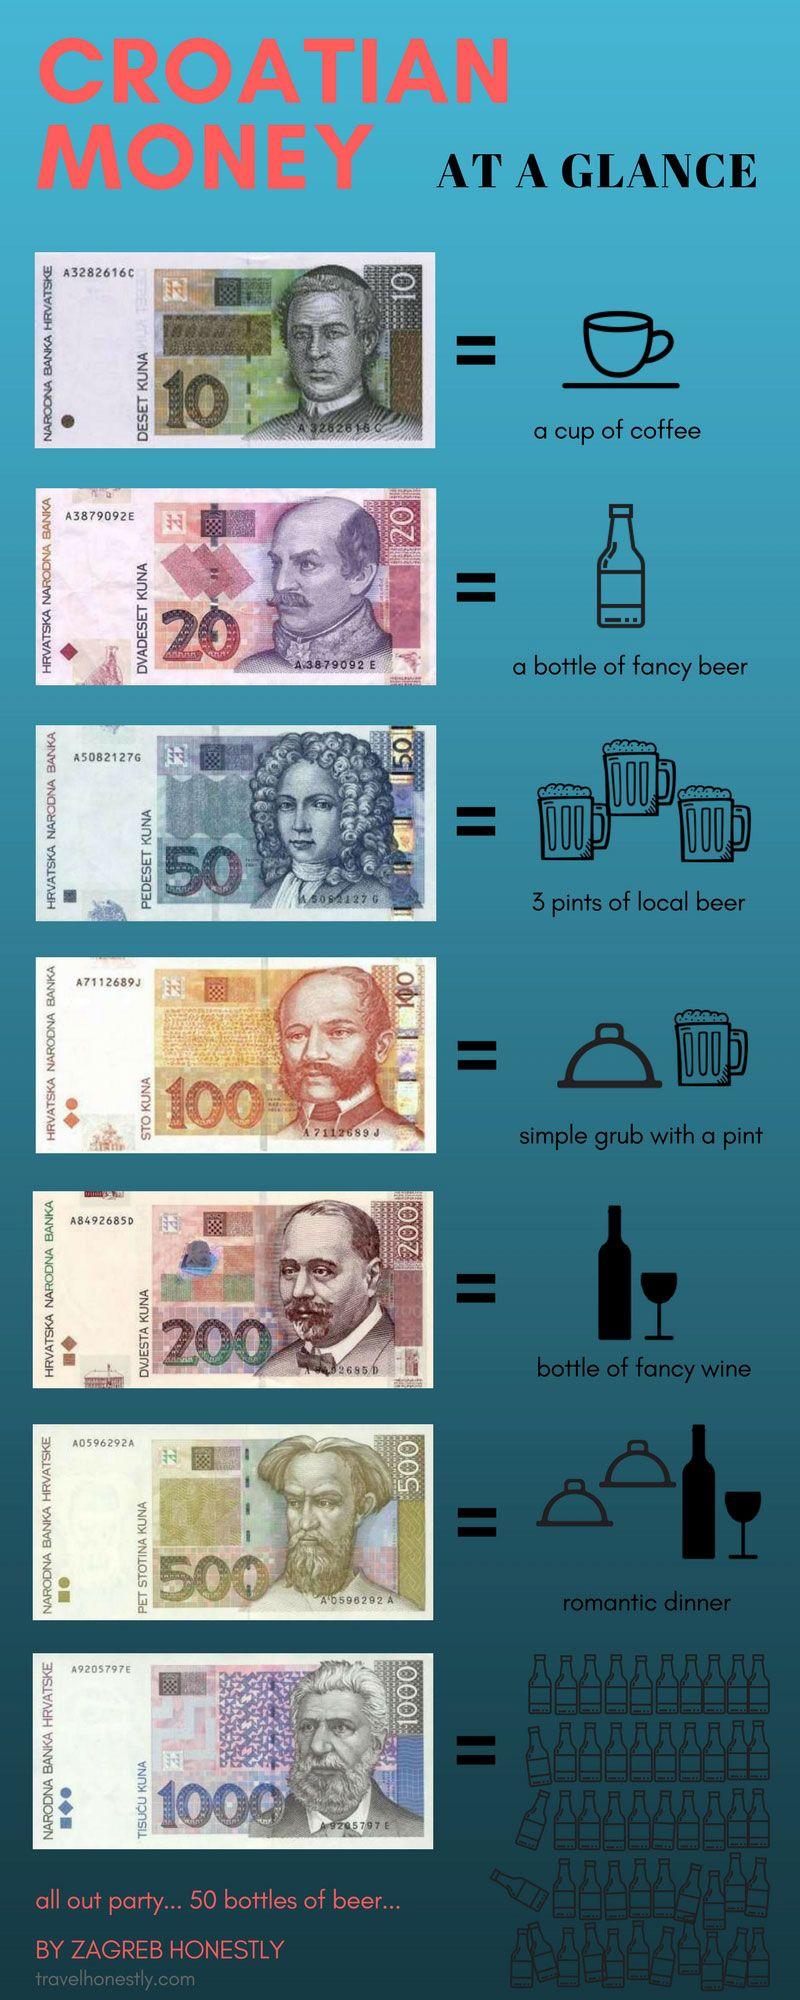 Croatian Money 17 Useful And Strange Facts You Should Know Travel Infographic Croatia Travel Croatian Money